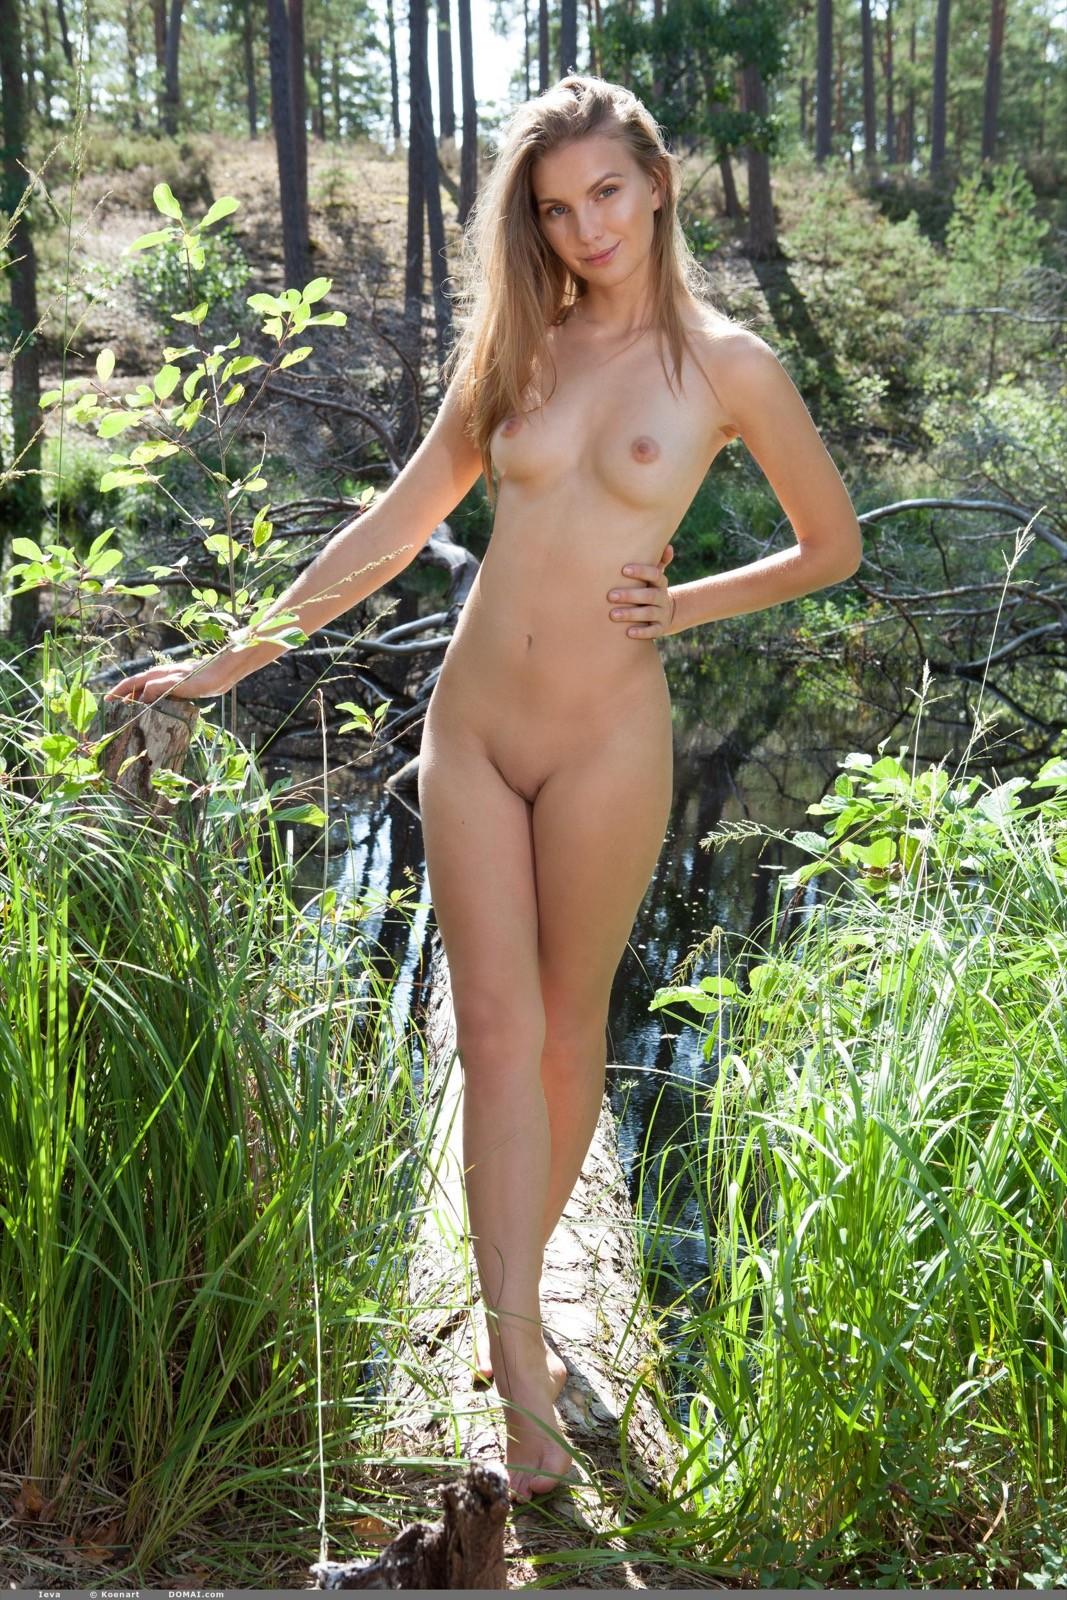 Голая девушка  у речки - фото